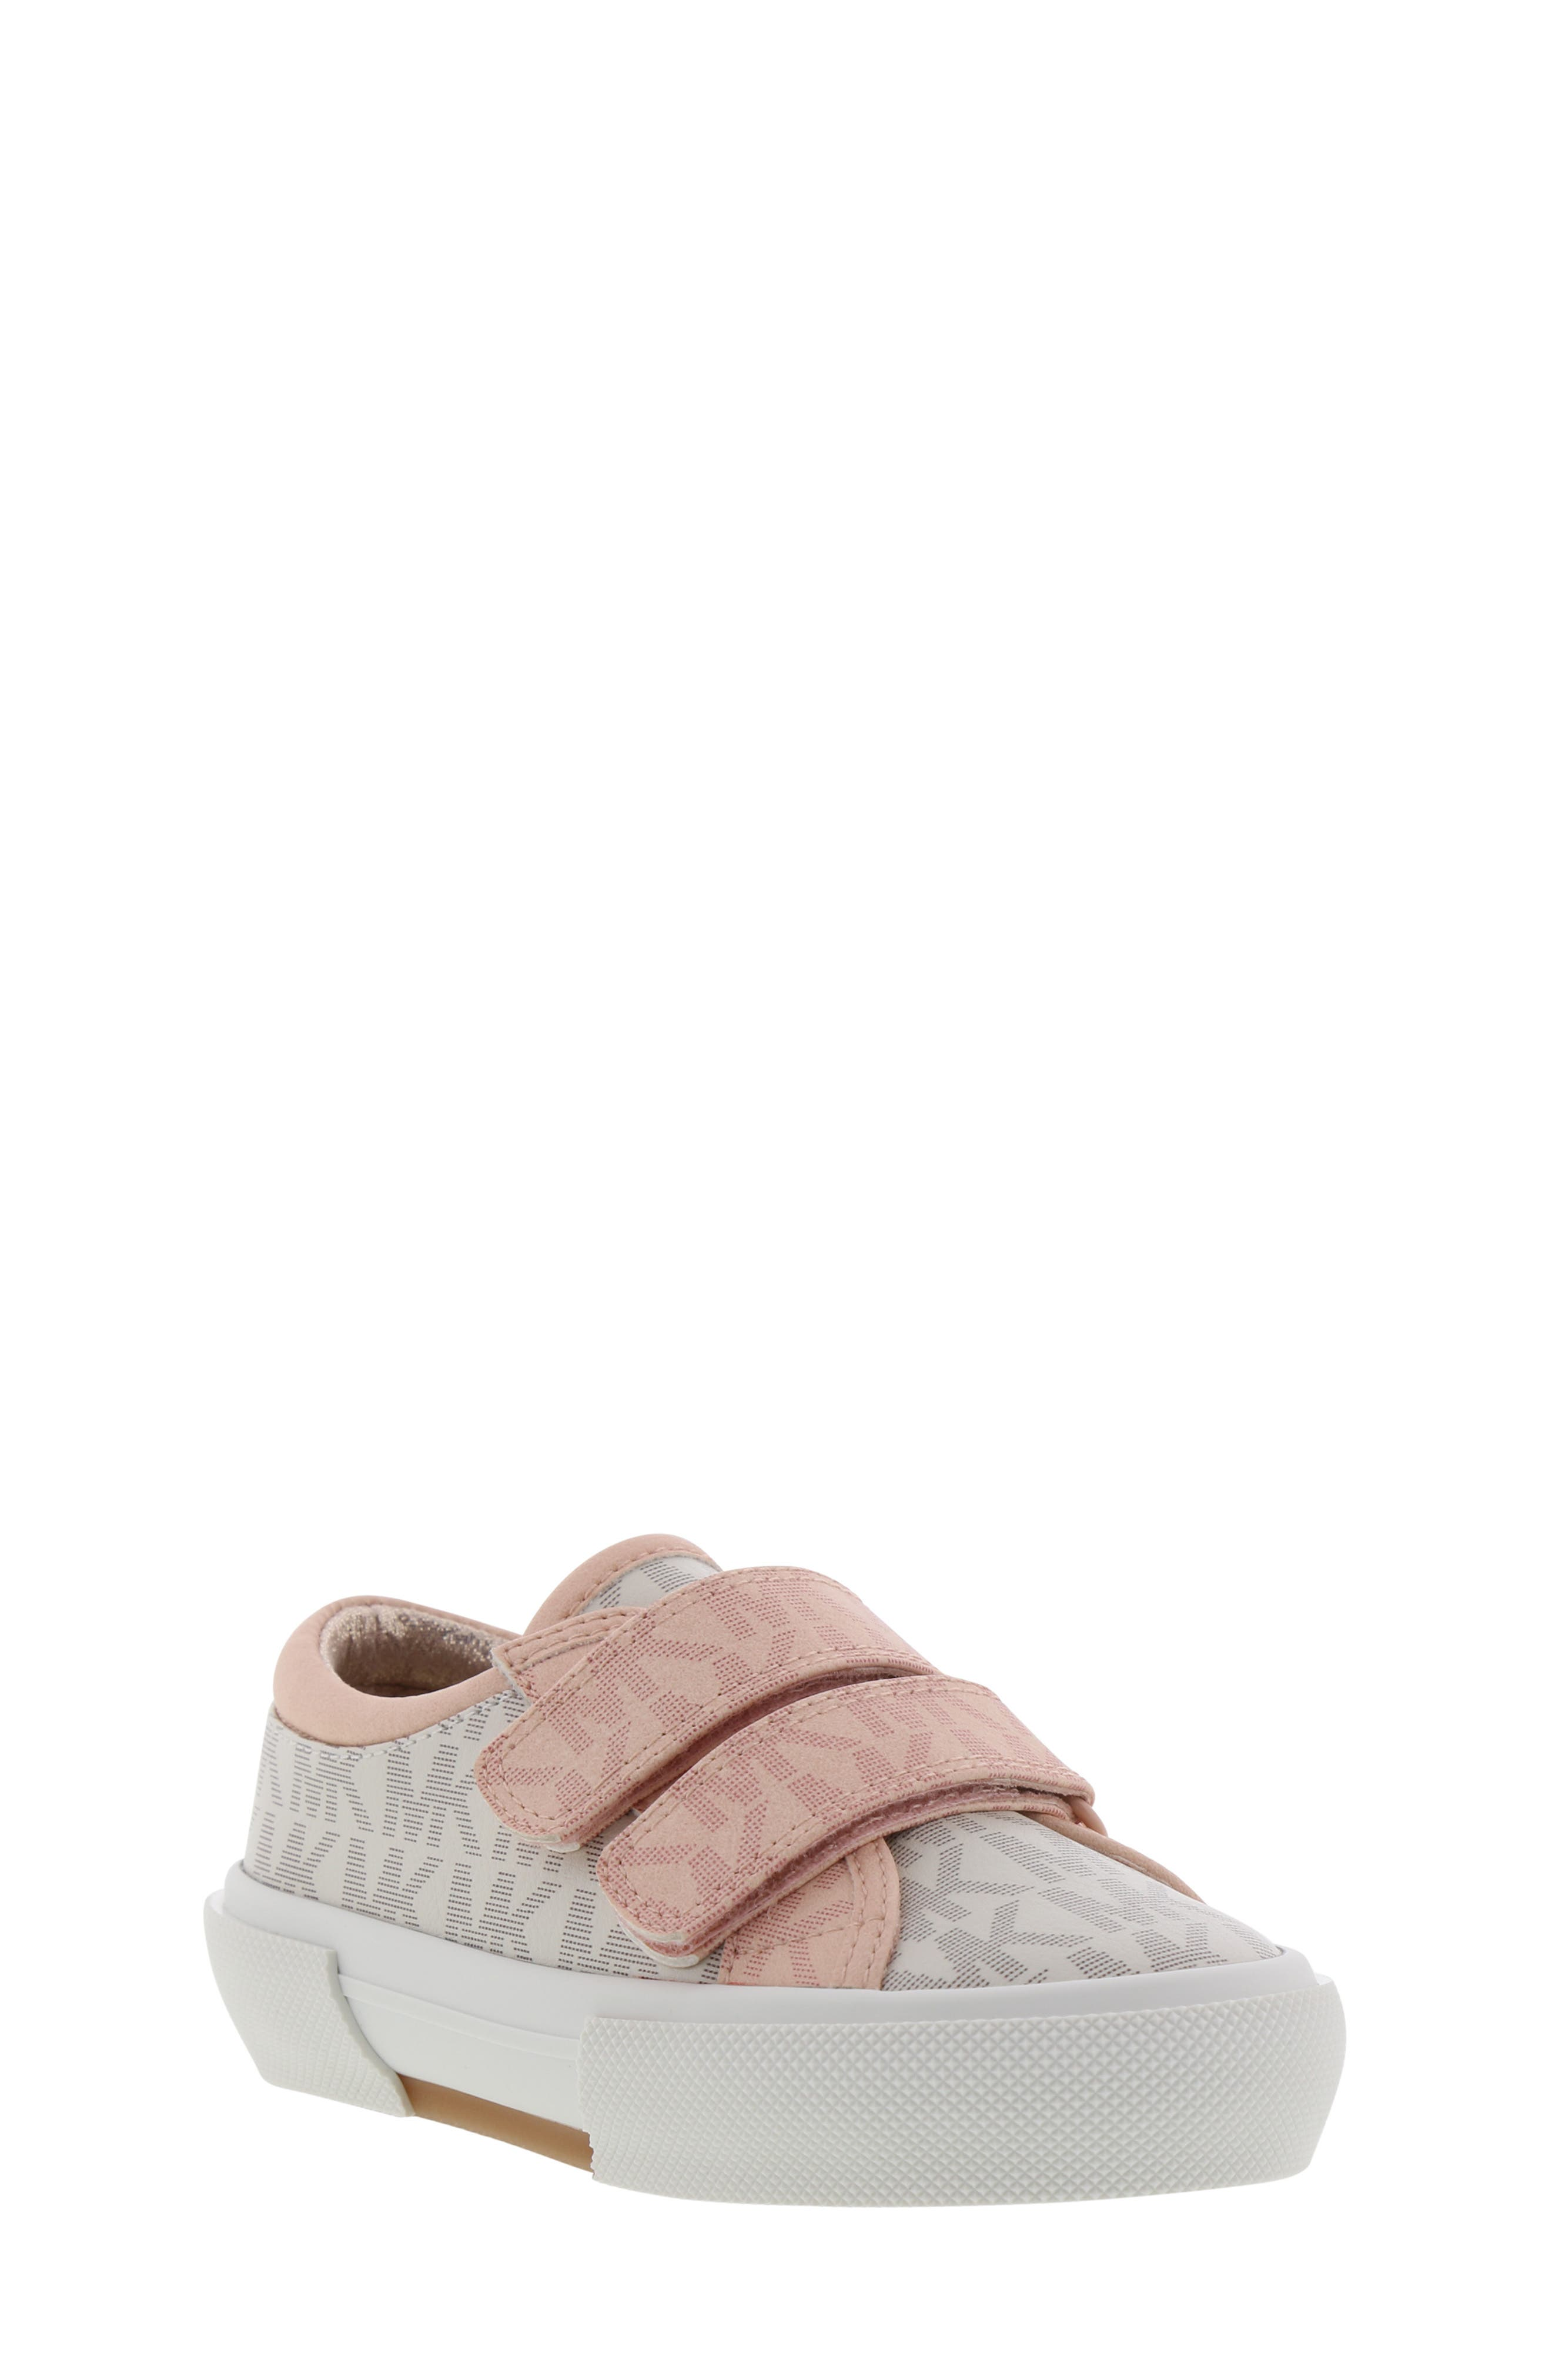 Ima Double Platform Sneaker,                             Main thumbnail 1, color,                             VANILLA/ BLUSH